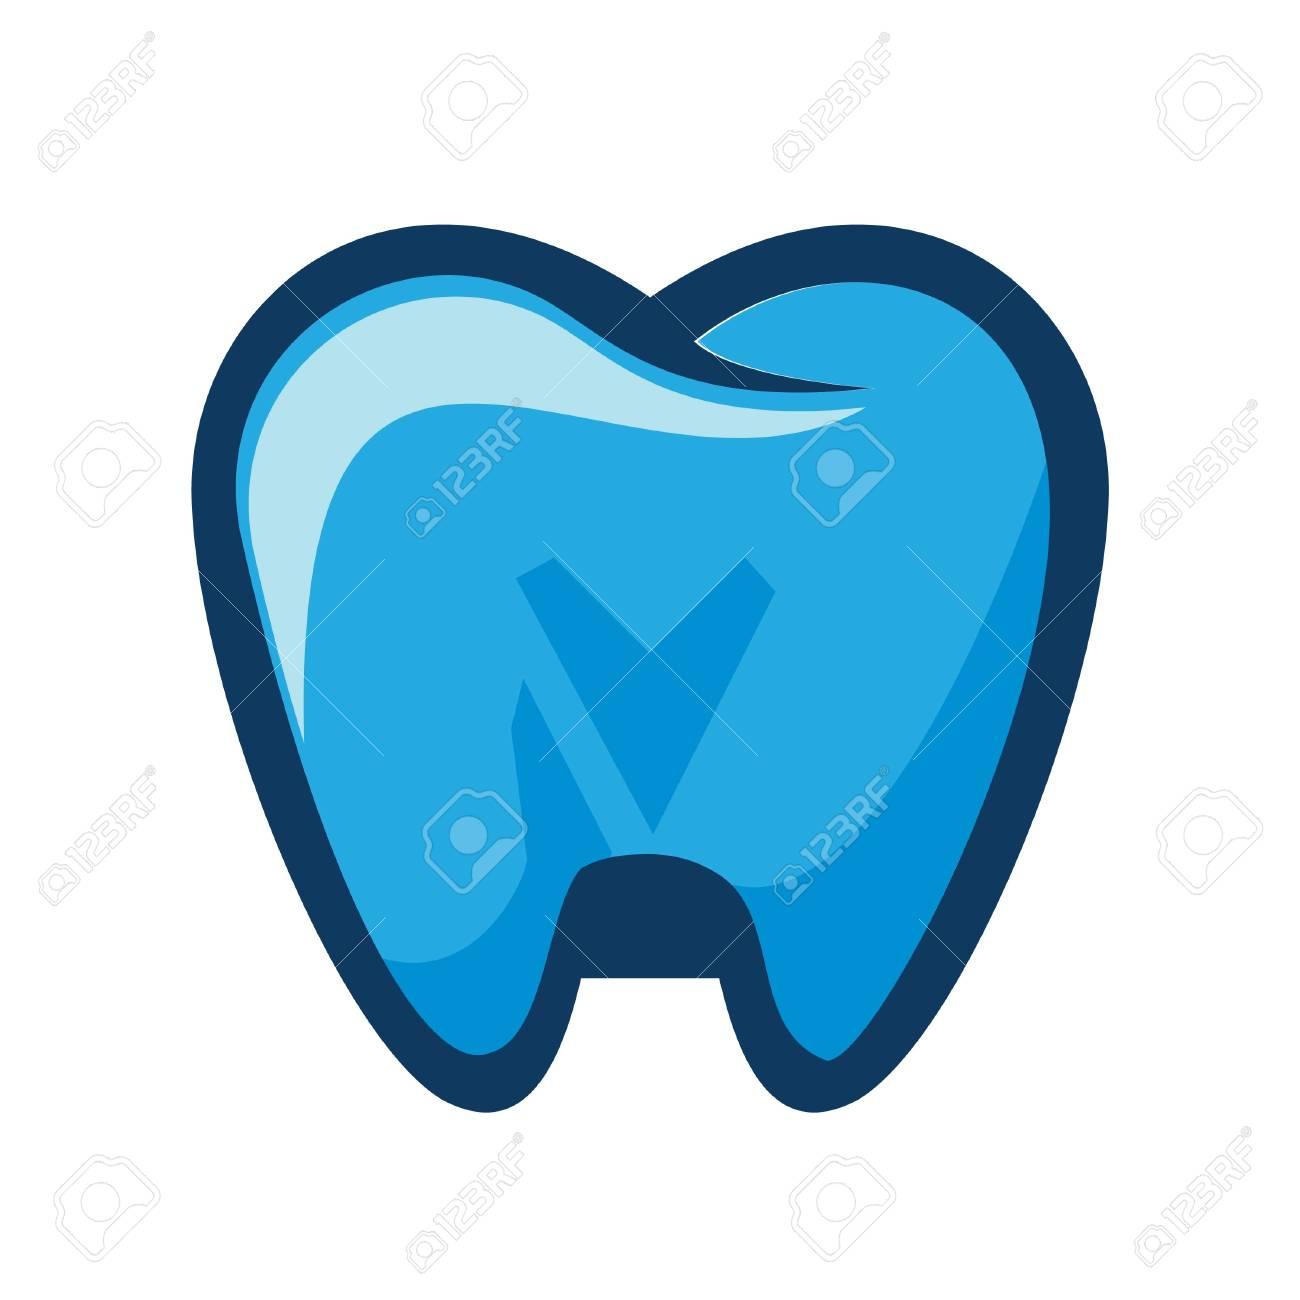 Tooth Logo Vector Design Dental Clinic Logo Dental Clinic Dentist Royalty Free Cliparts Vectors And Stock Illustration Image 92424725